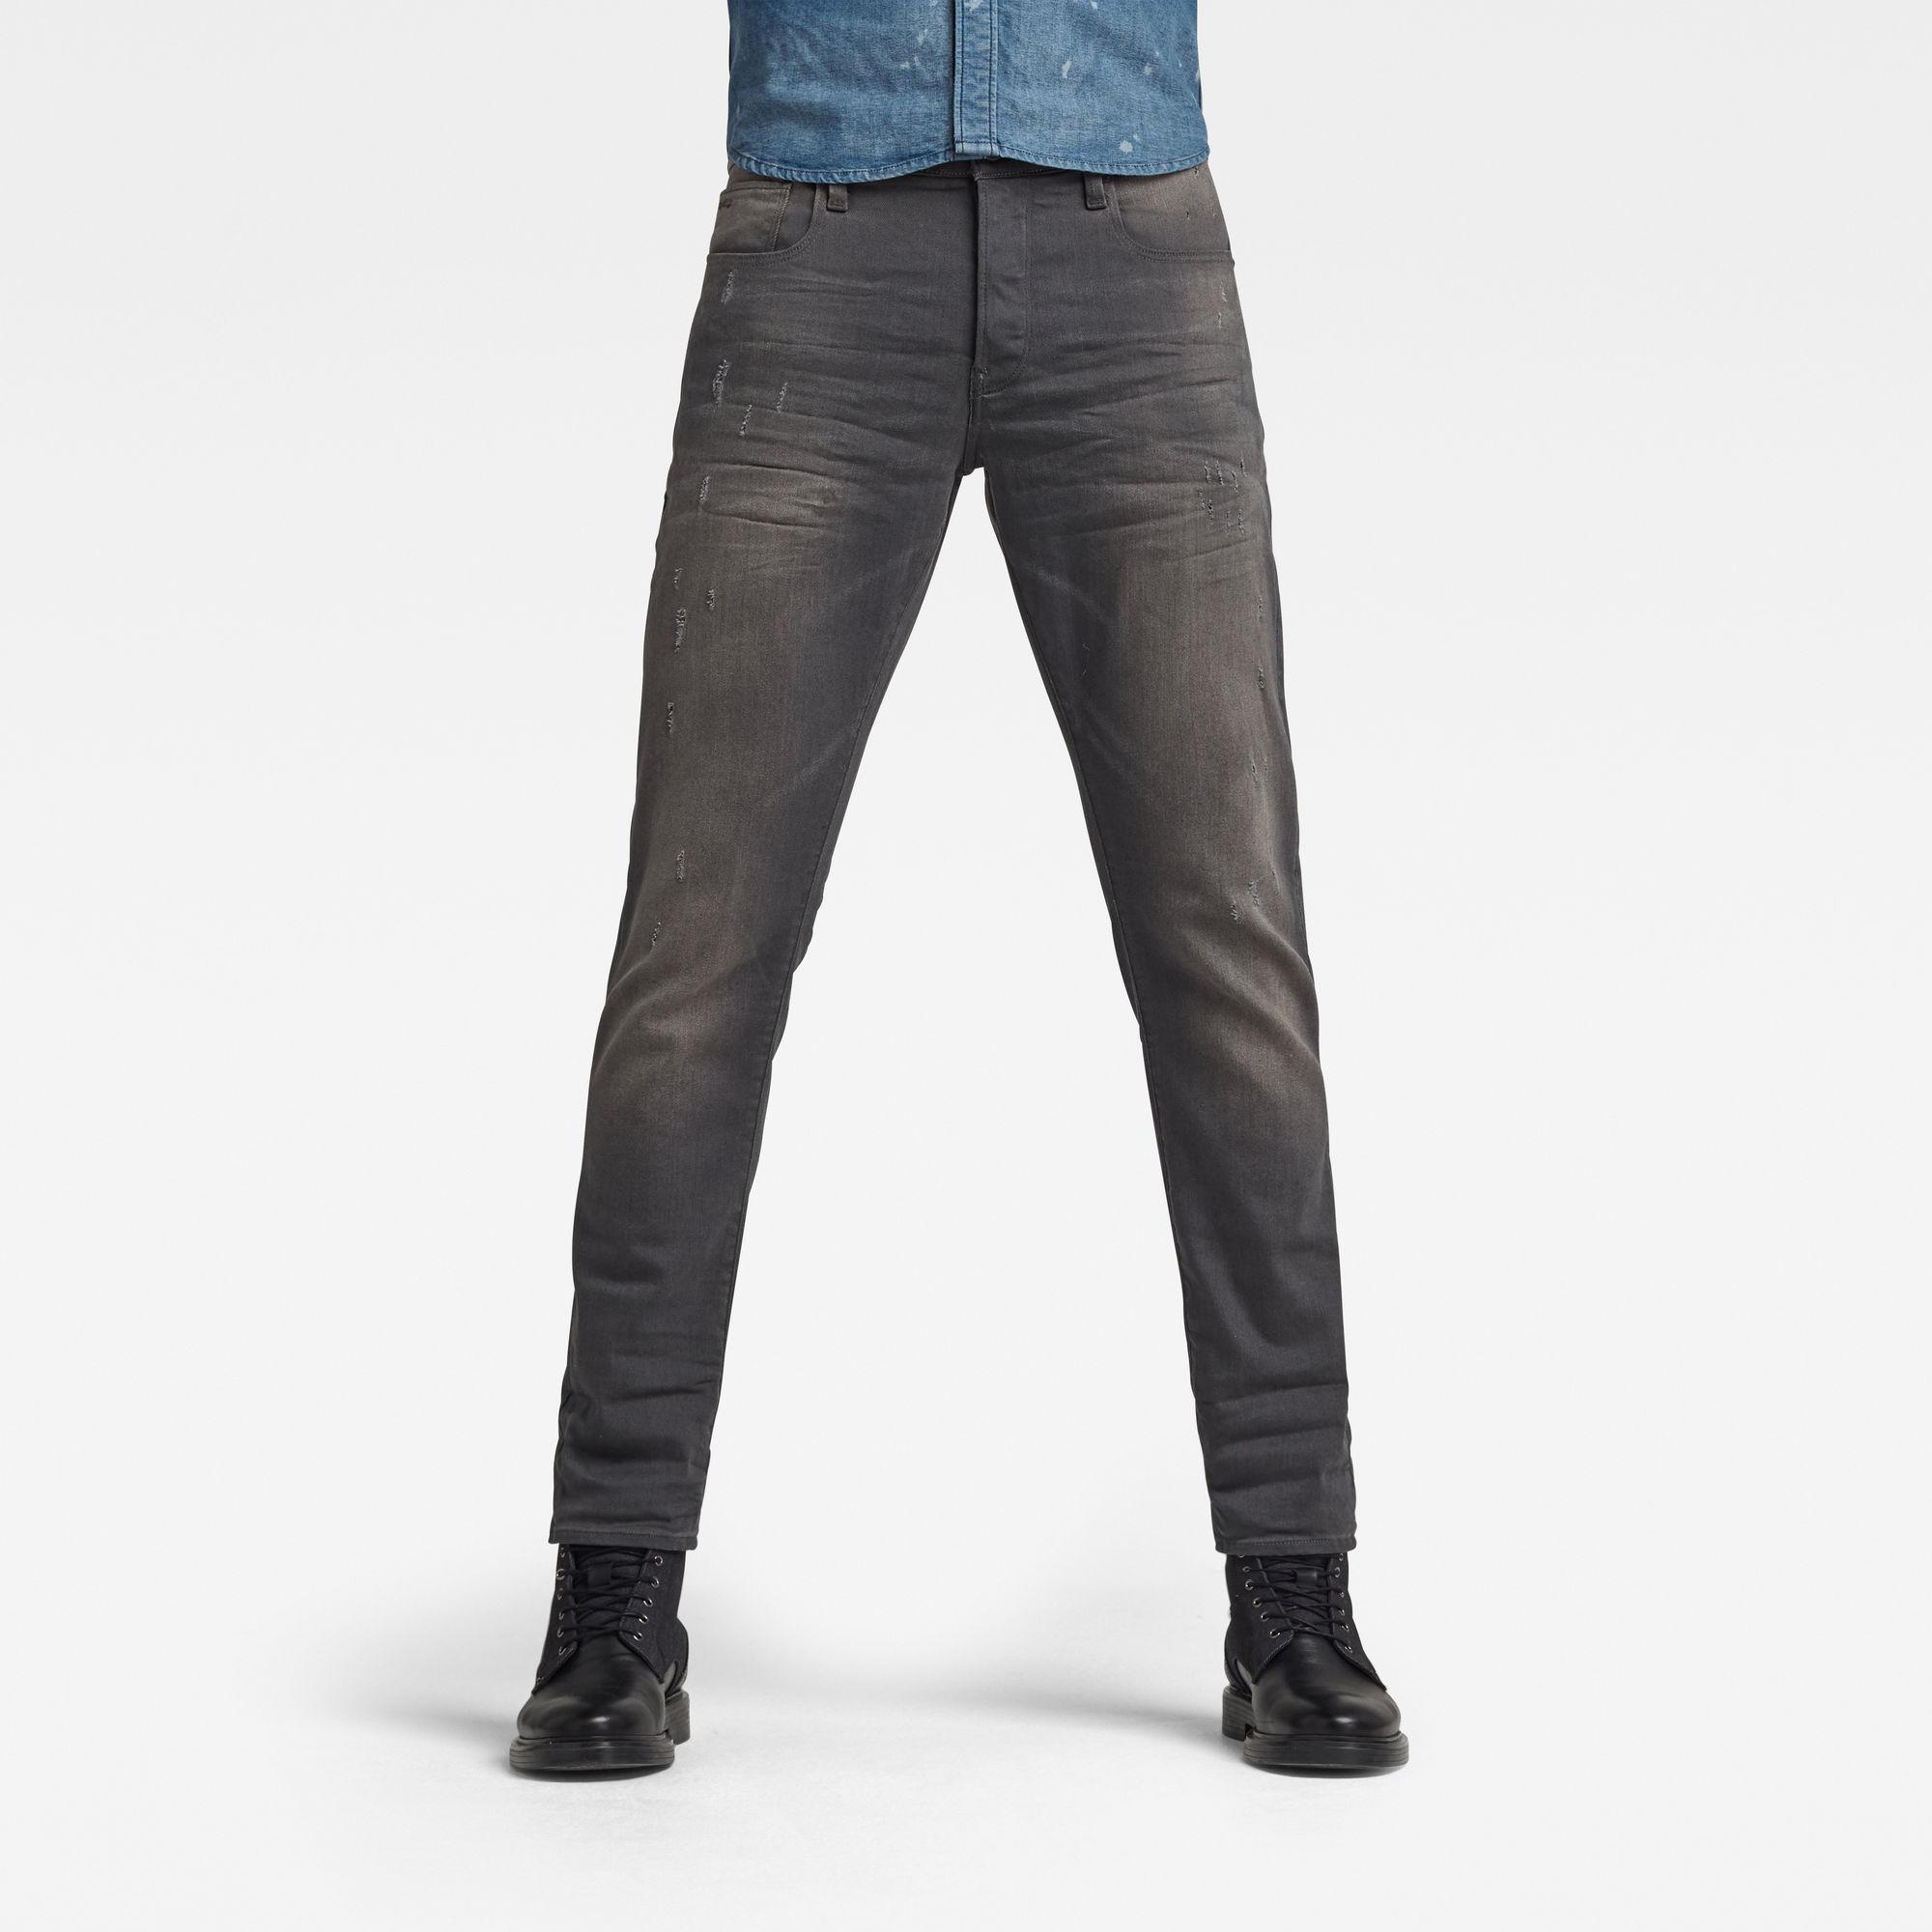 G-Star RAW Heren 3301 Straight Tapered Jeans Lichtblauw